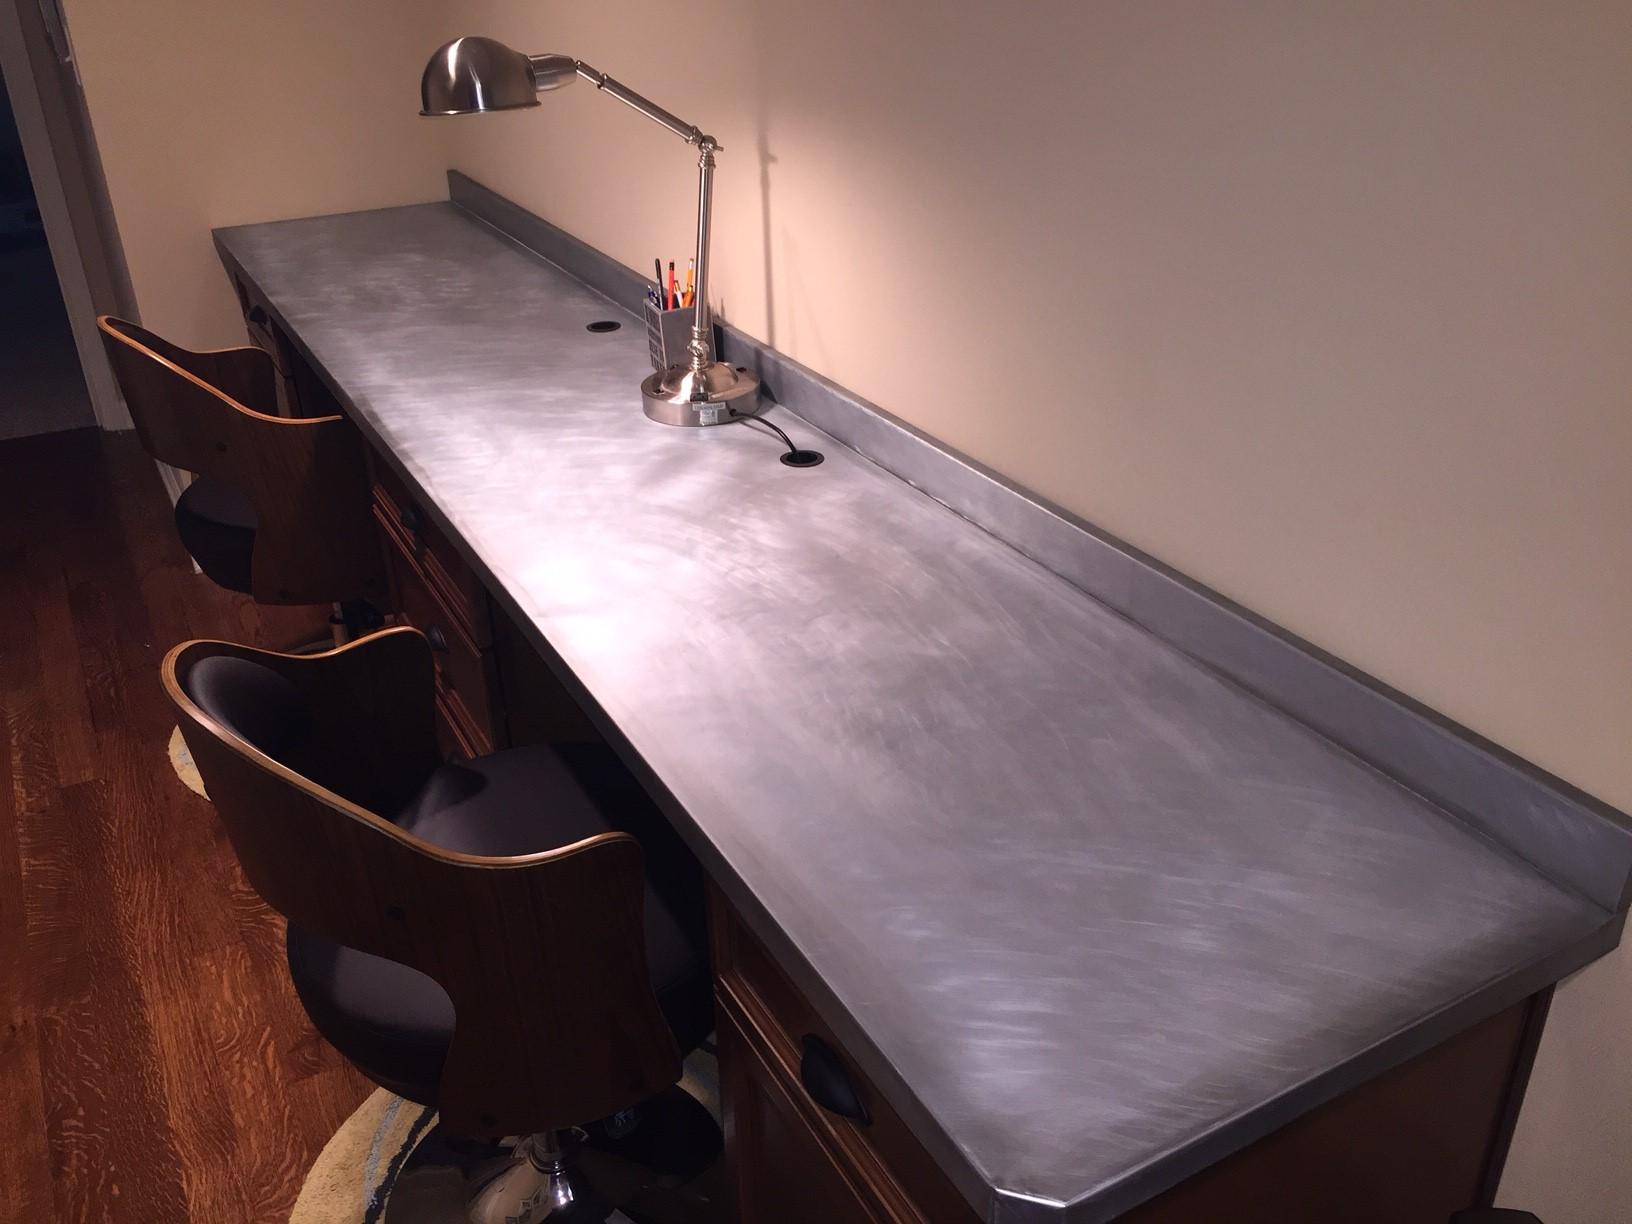 diy-zinc-desk-16387653582-o.jpg